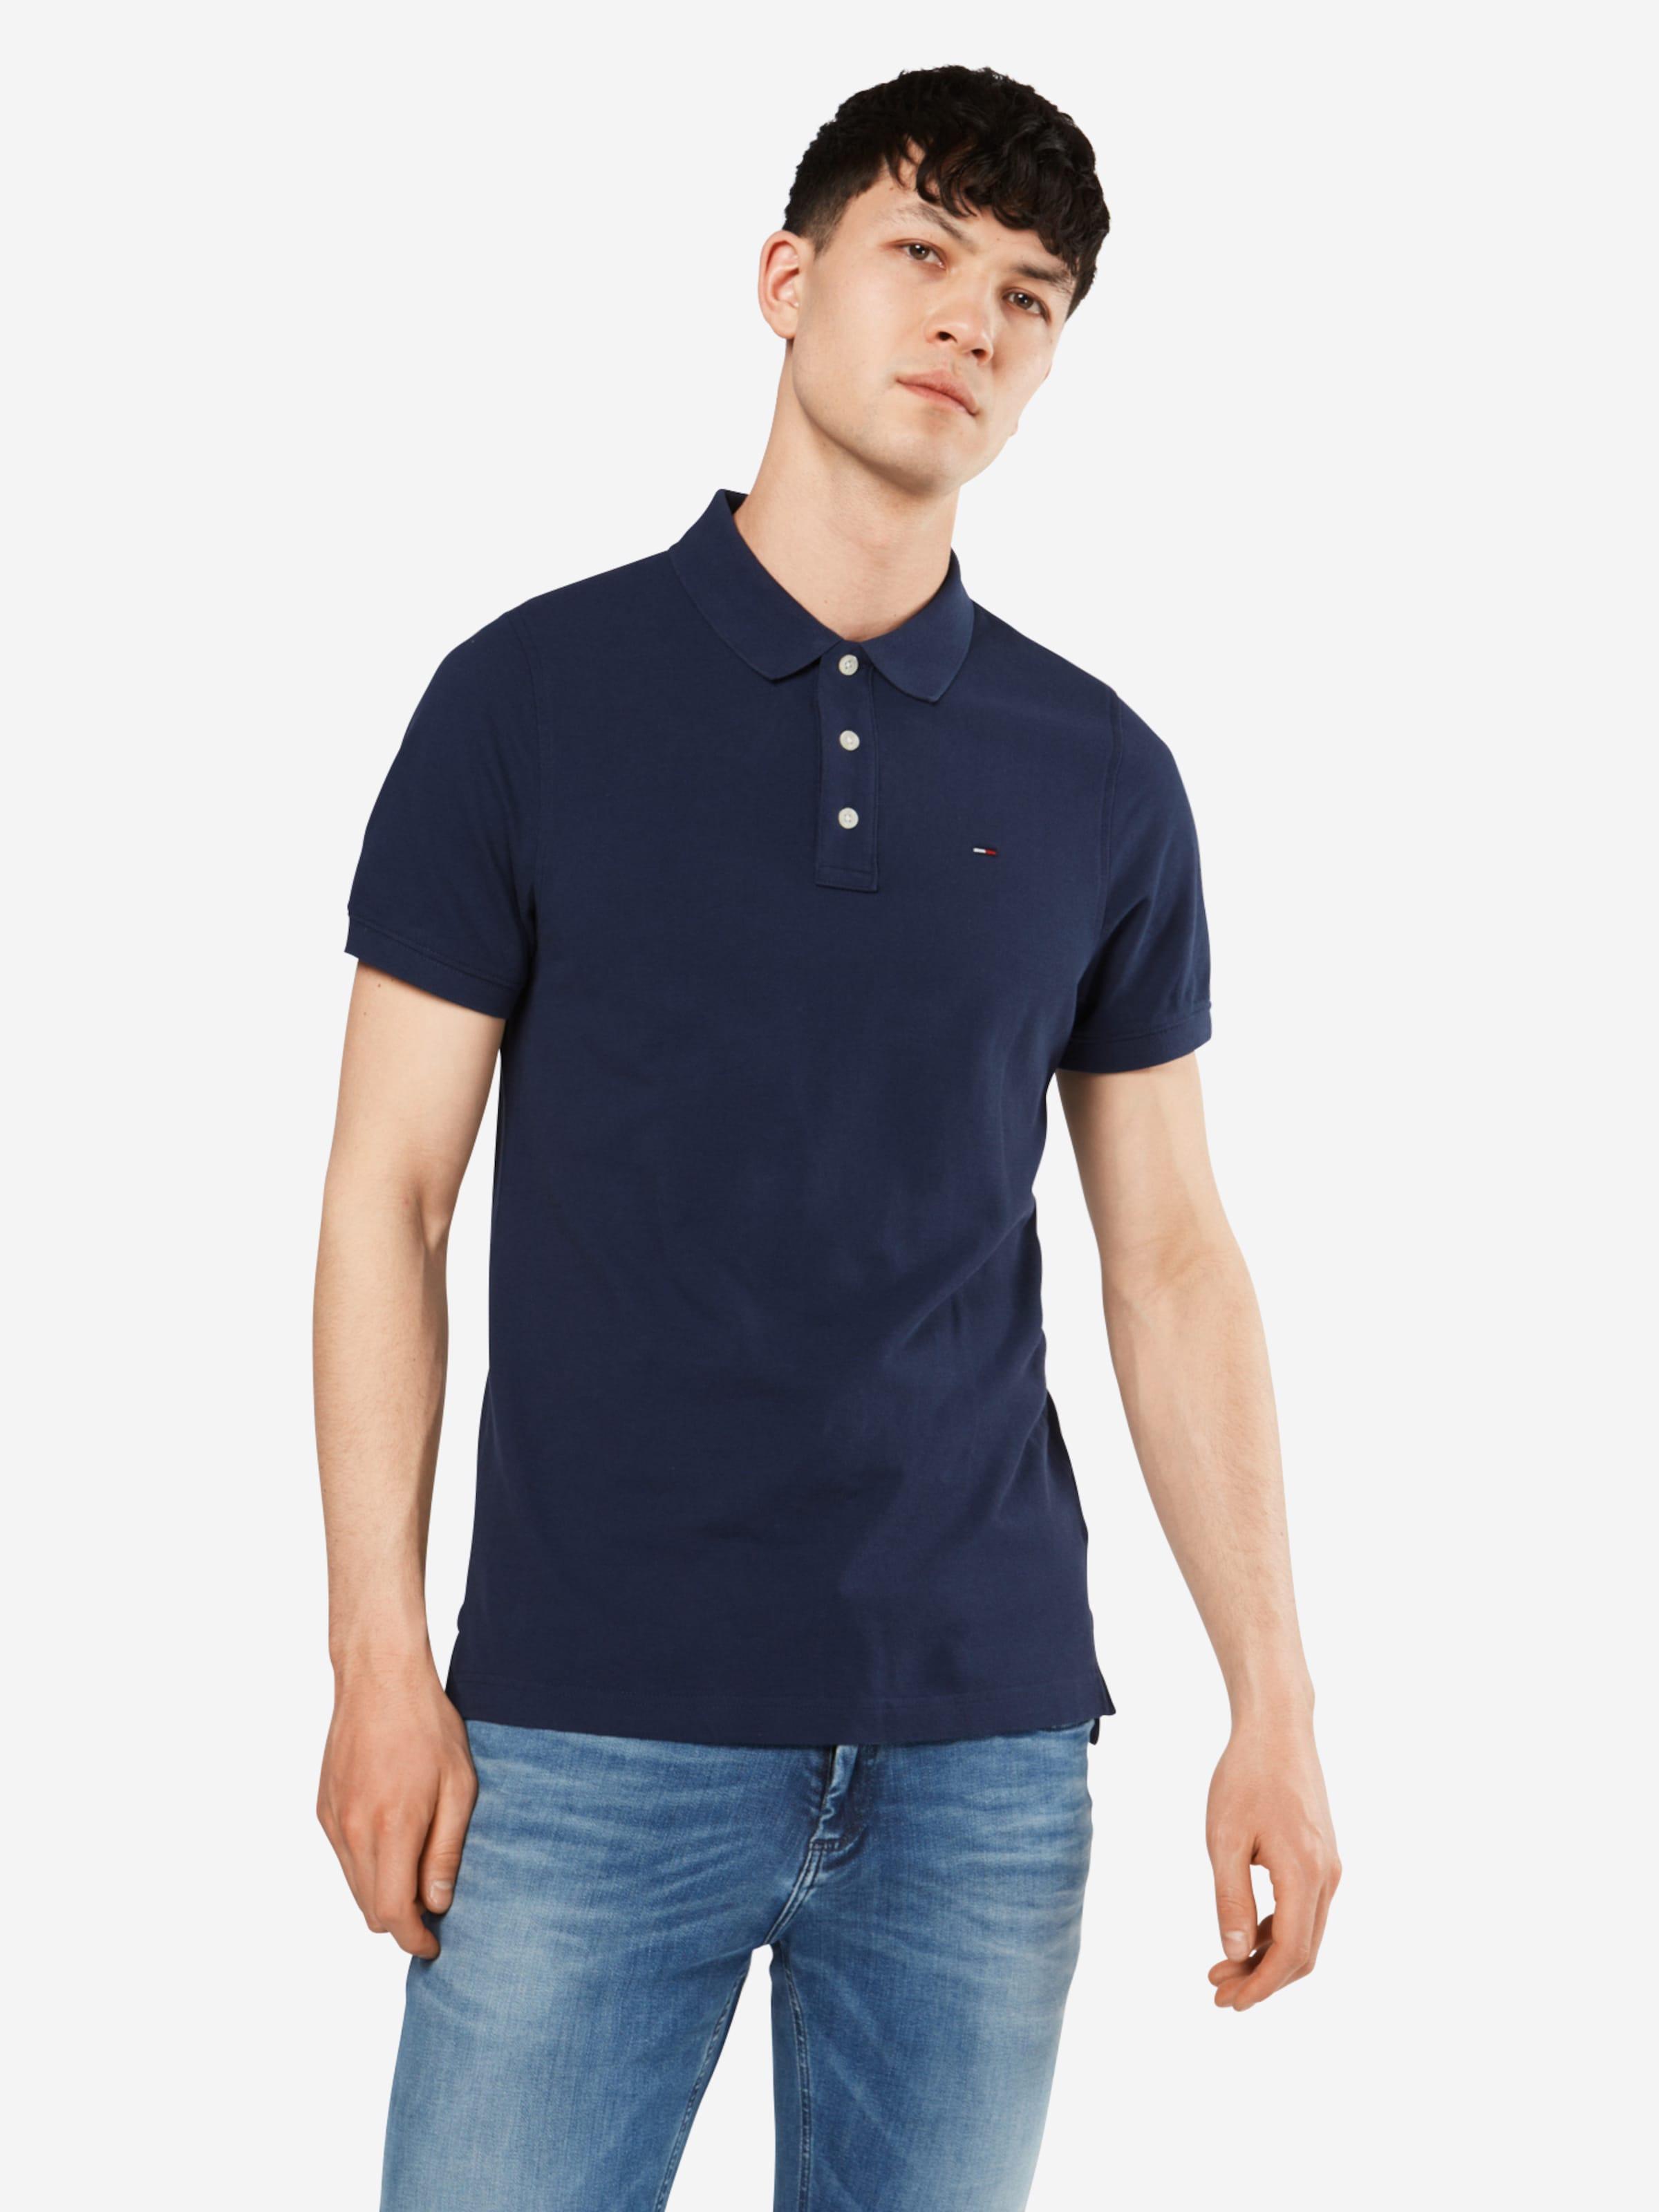 En Bleu 'tjm S shirt Pique s' Original Tommy T Fine Foncé Jeans 1cTKJlF